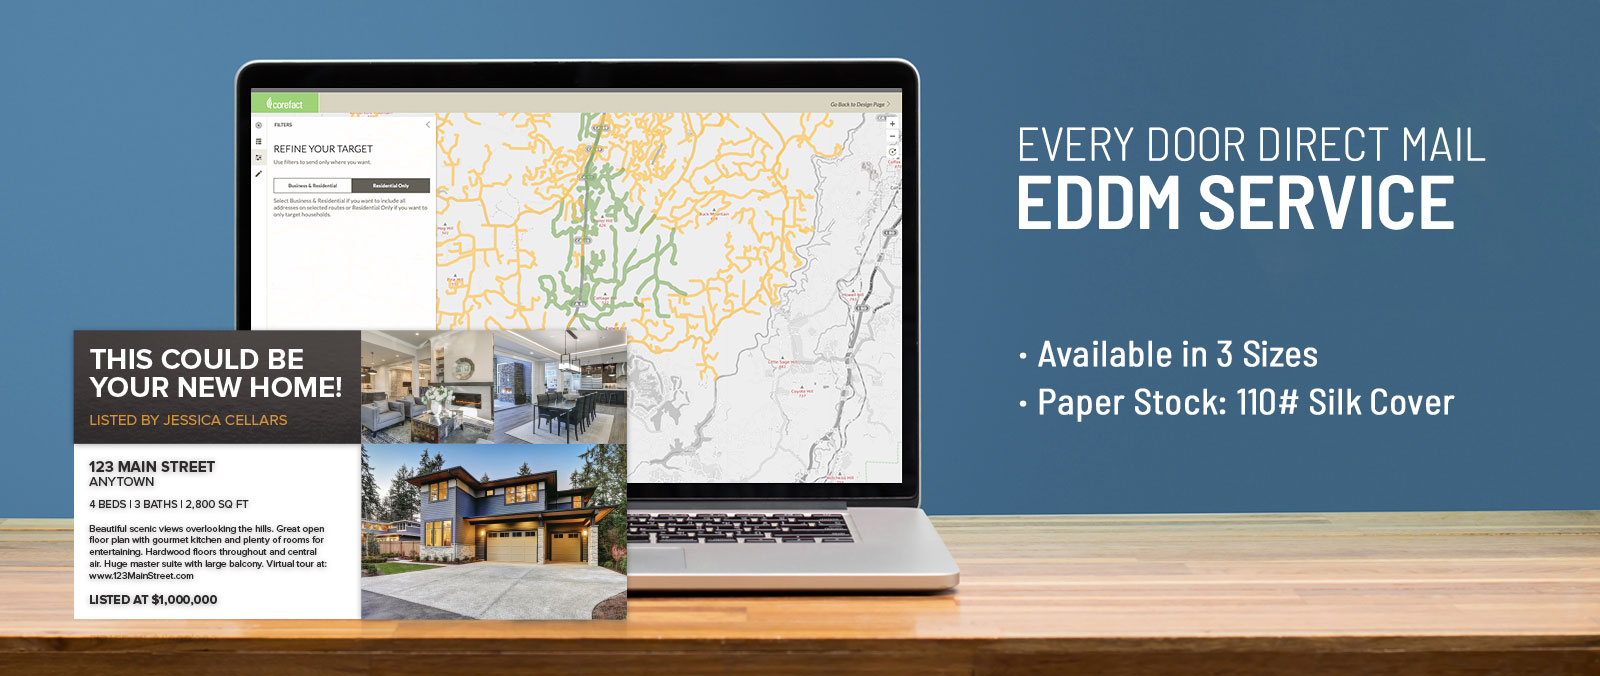 EDDM Mailers